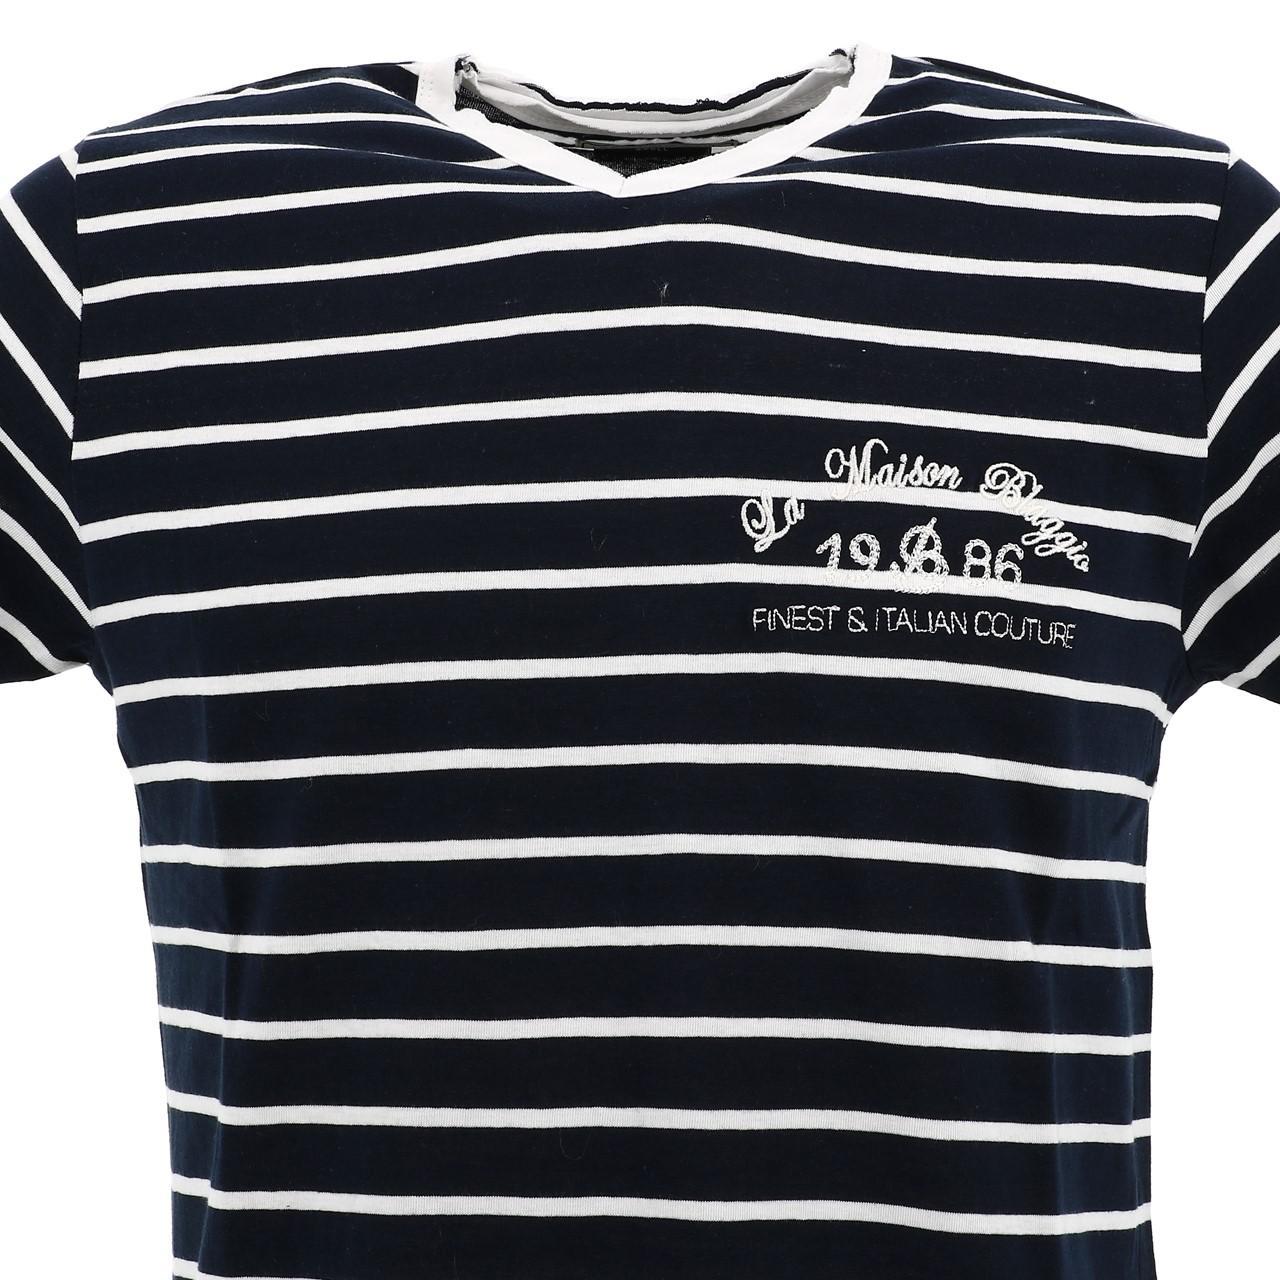 Short-Sleeve-T-Shirt-La-Maison-Blaggio-Mavili-Navy-Wht-Mc-Tee-Blue-27335 thumbnail 2